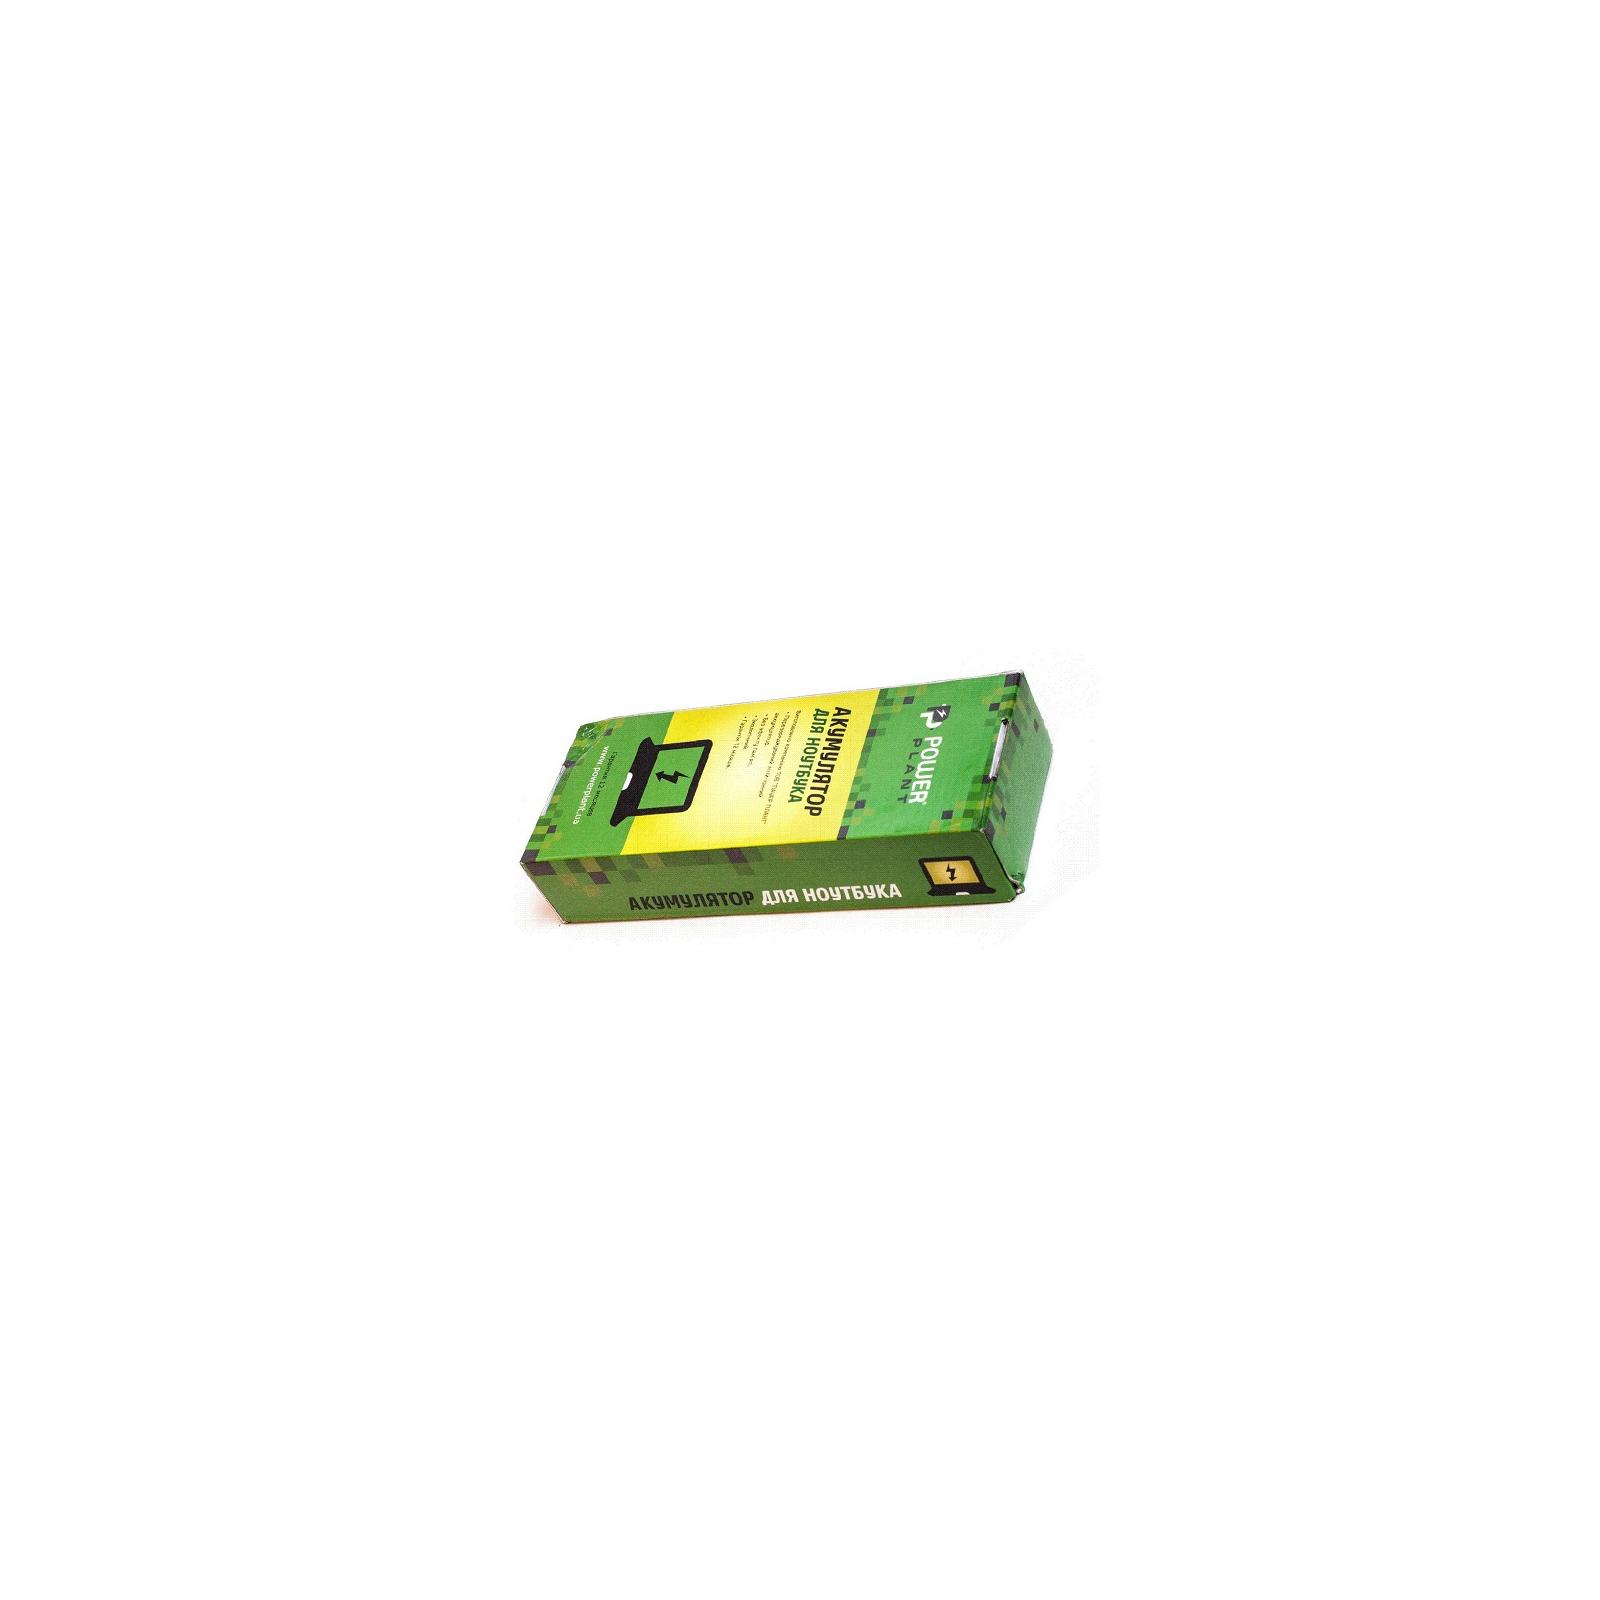 Аккумулятор для ноутбука LENOVO ThinkPad SL410K (FRU42T4795, IMSL40LH) 10.8V 5200mAh PowerPlant (NB00000069) изображение 3